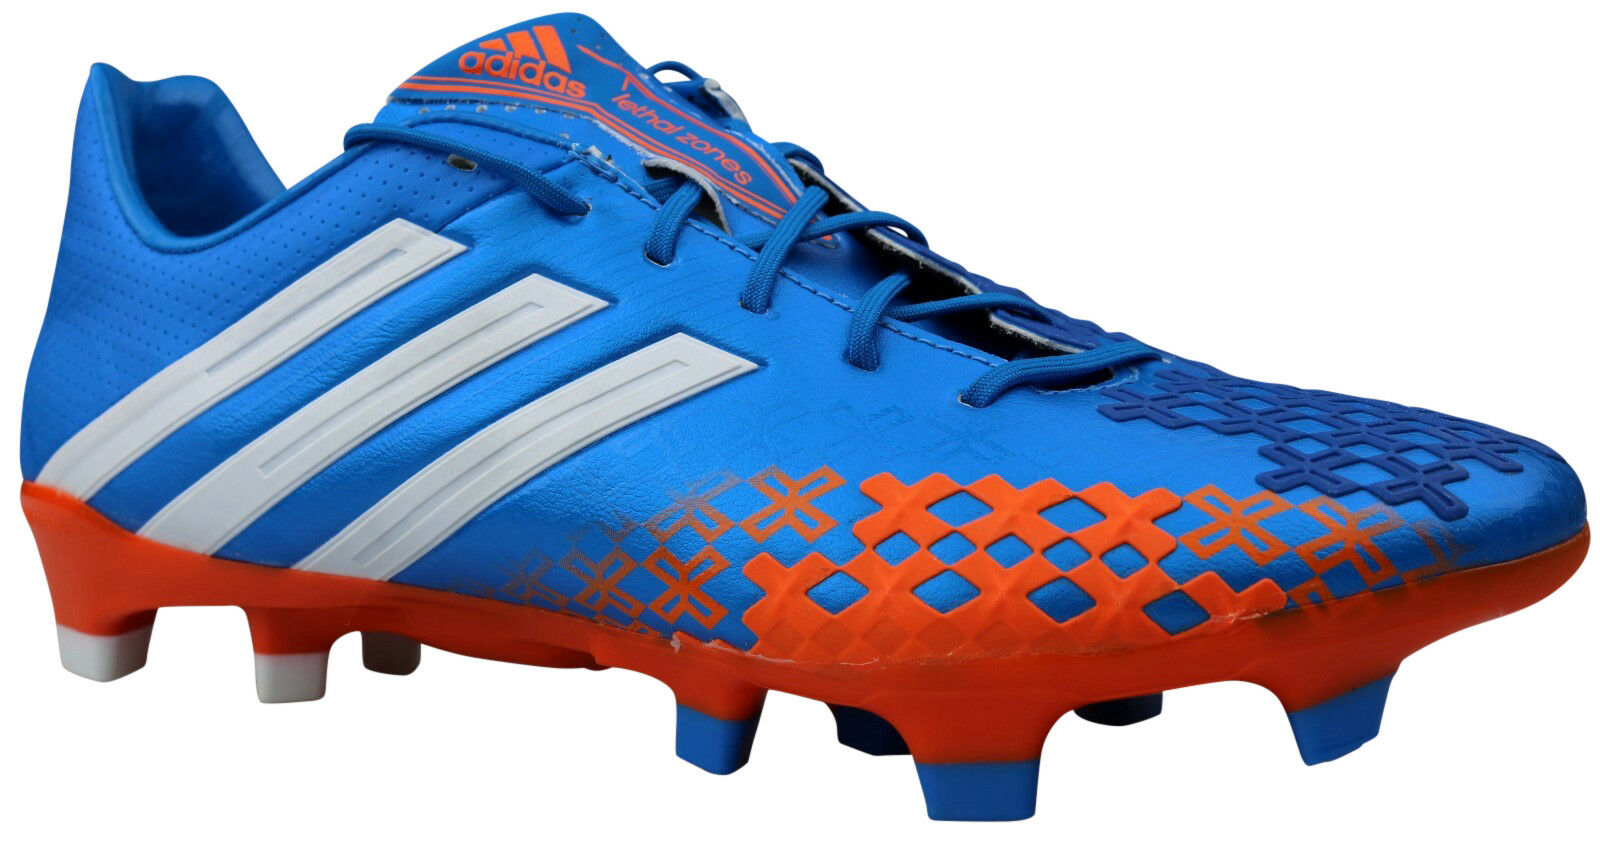 Adidas projoator lz trx fg botas de fútbol levas azul q21666 talla 39 & 40 nuevo embalaje original